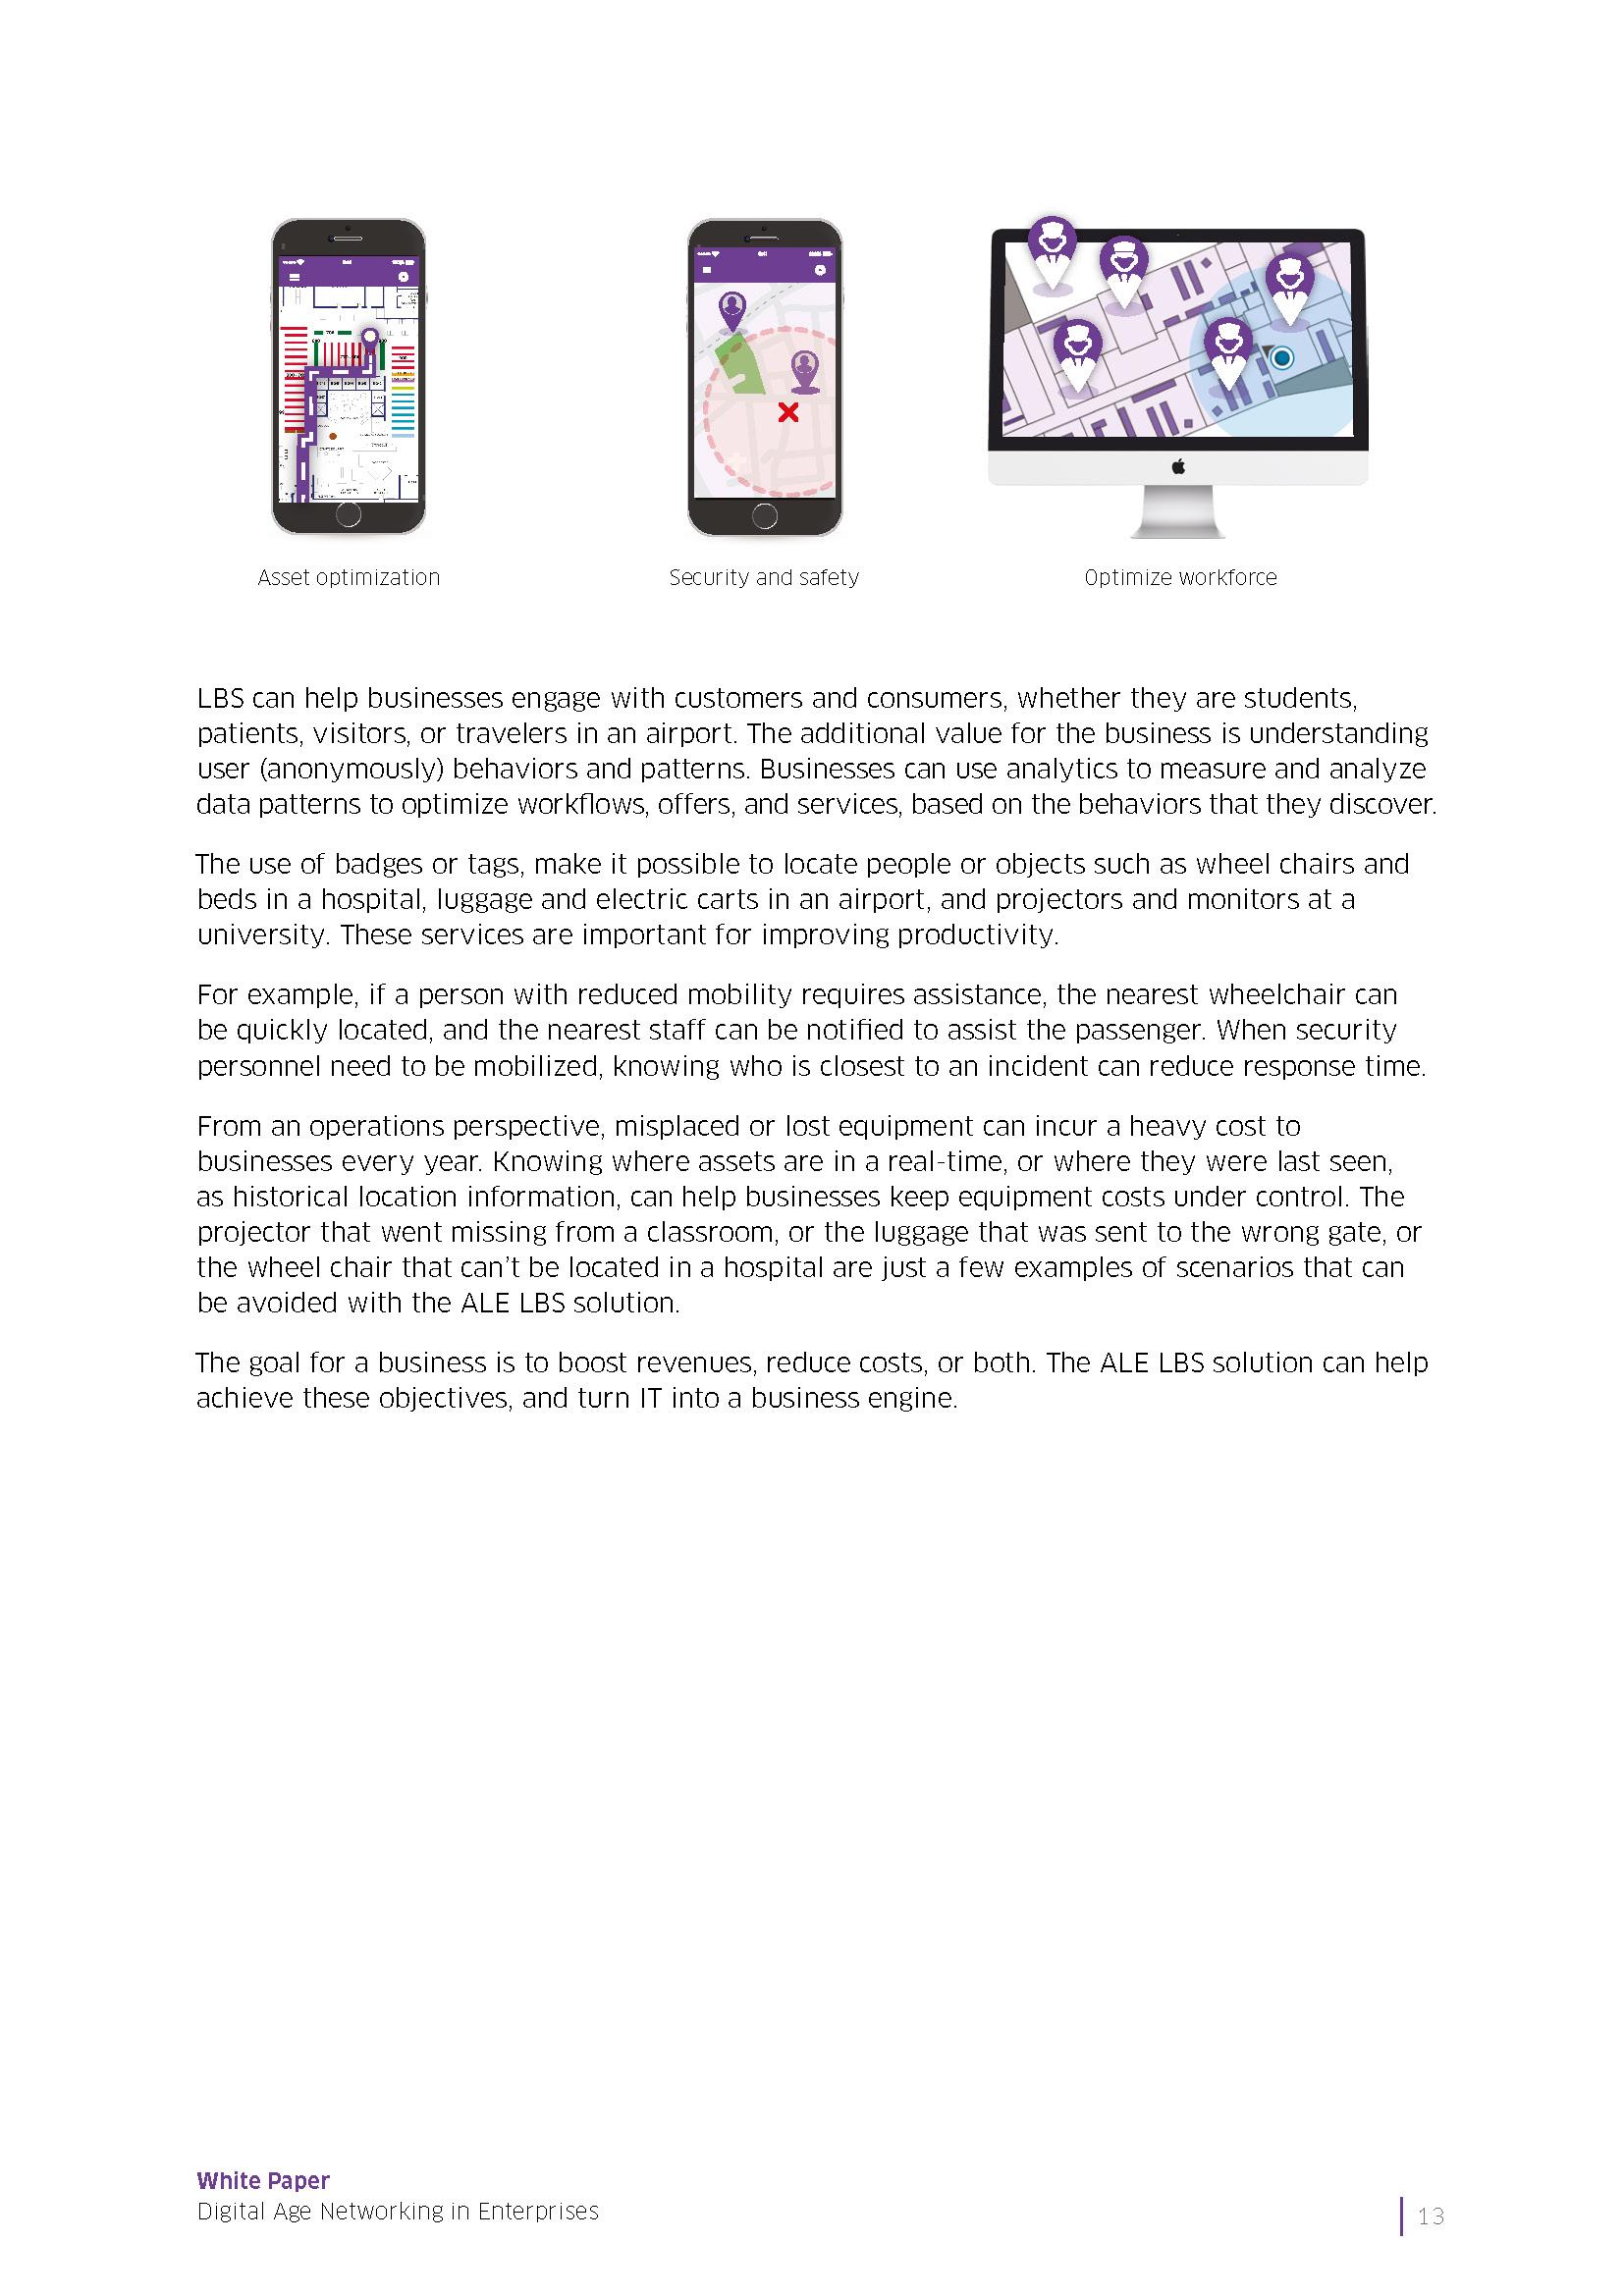 digital-age-networking-enterprises_Page_13